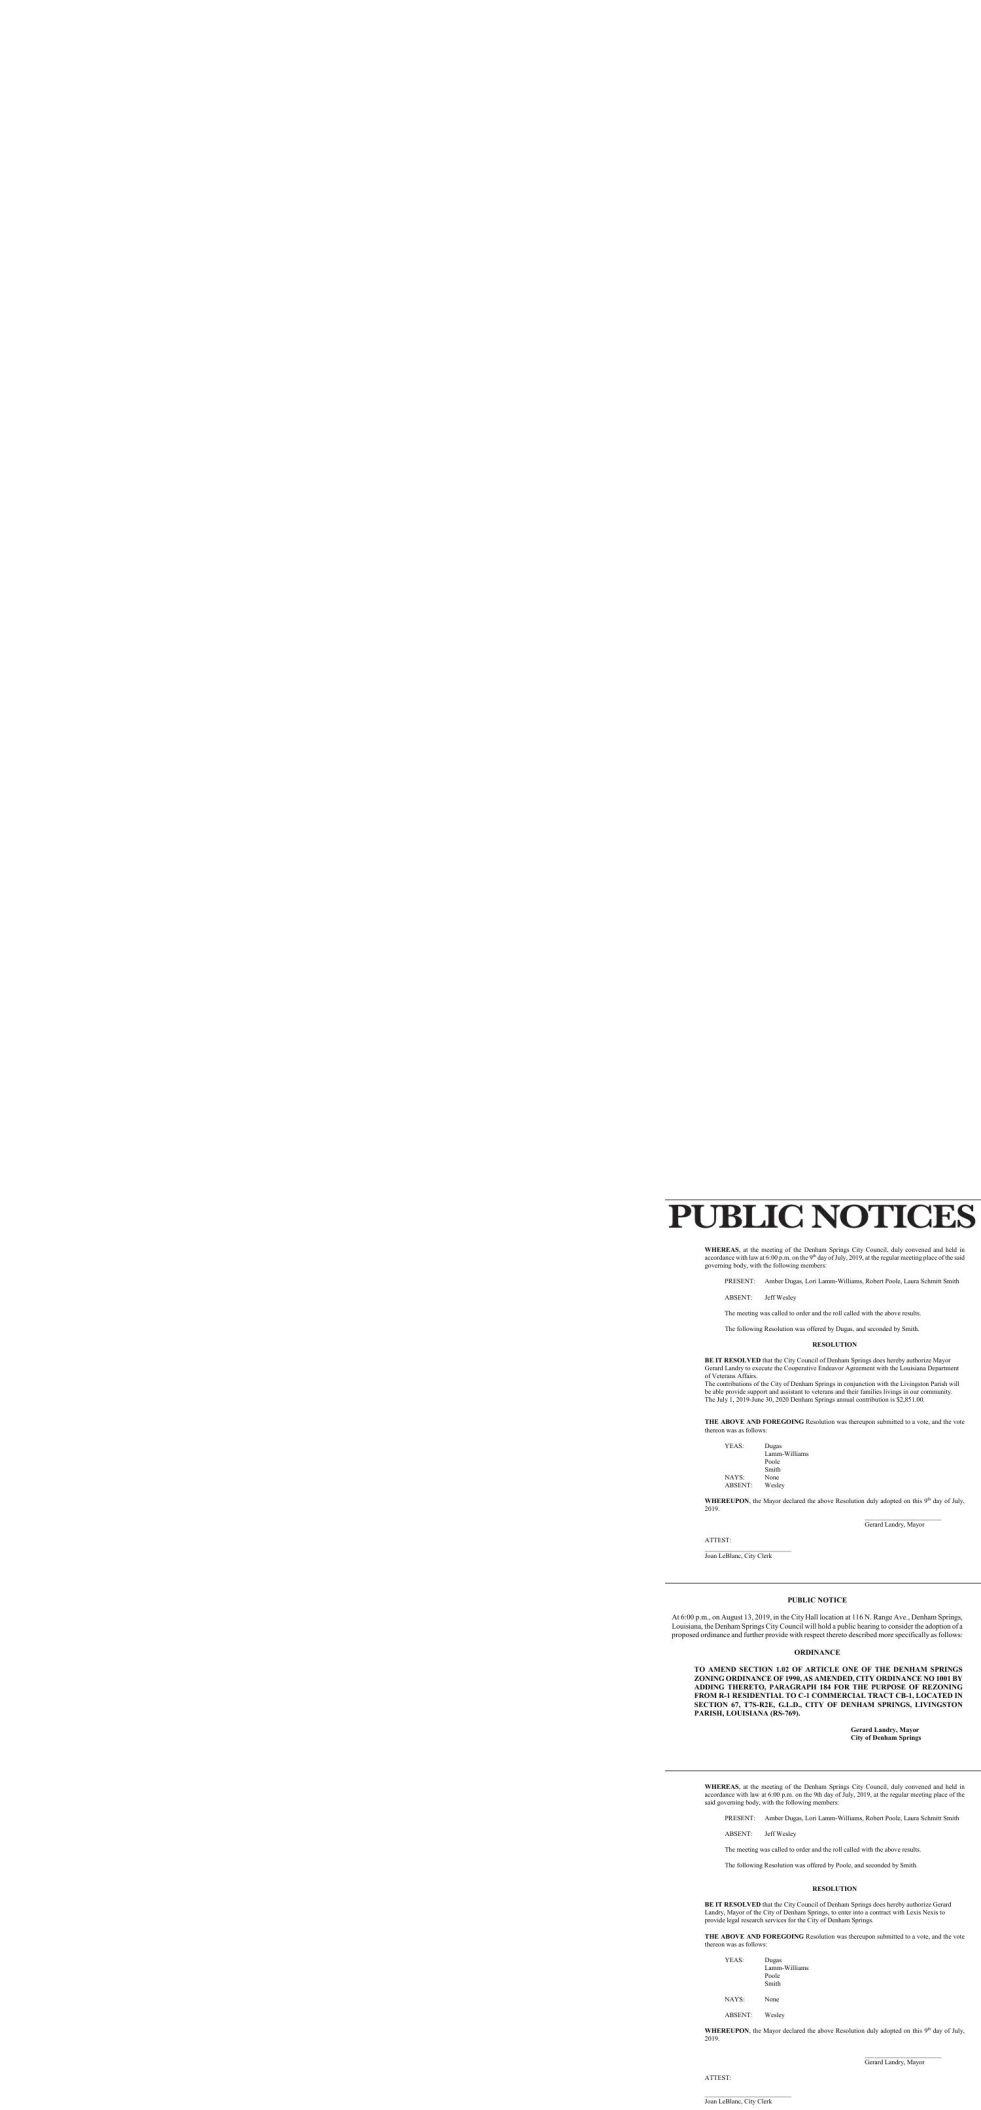 Public Notices published July 14, 2019